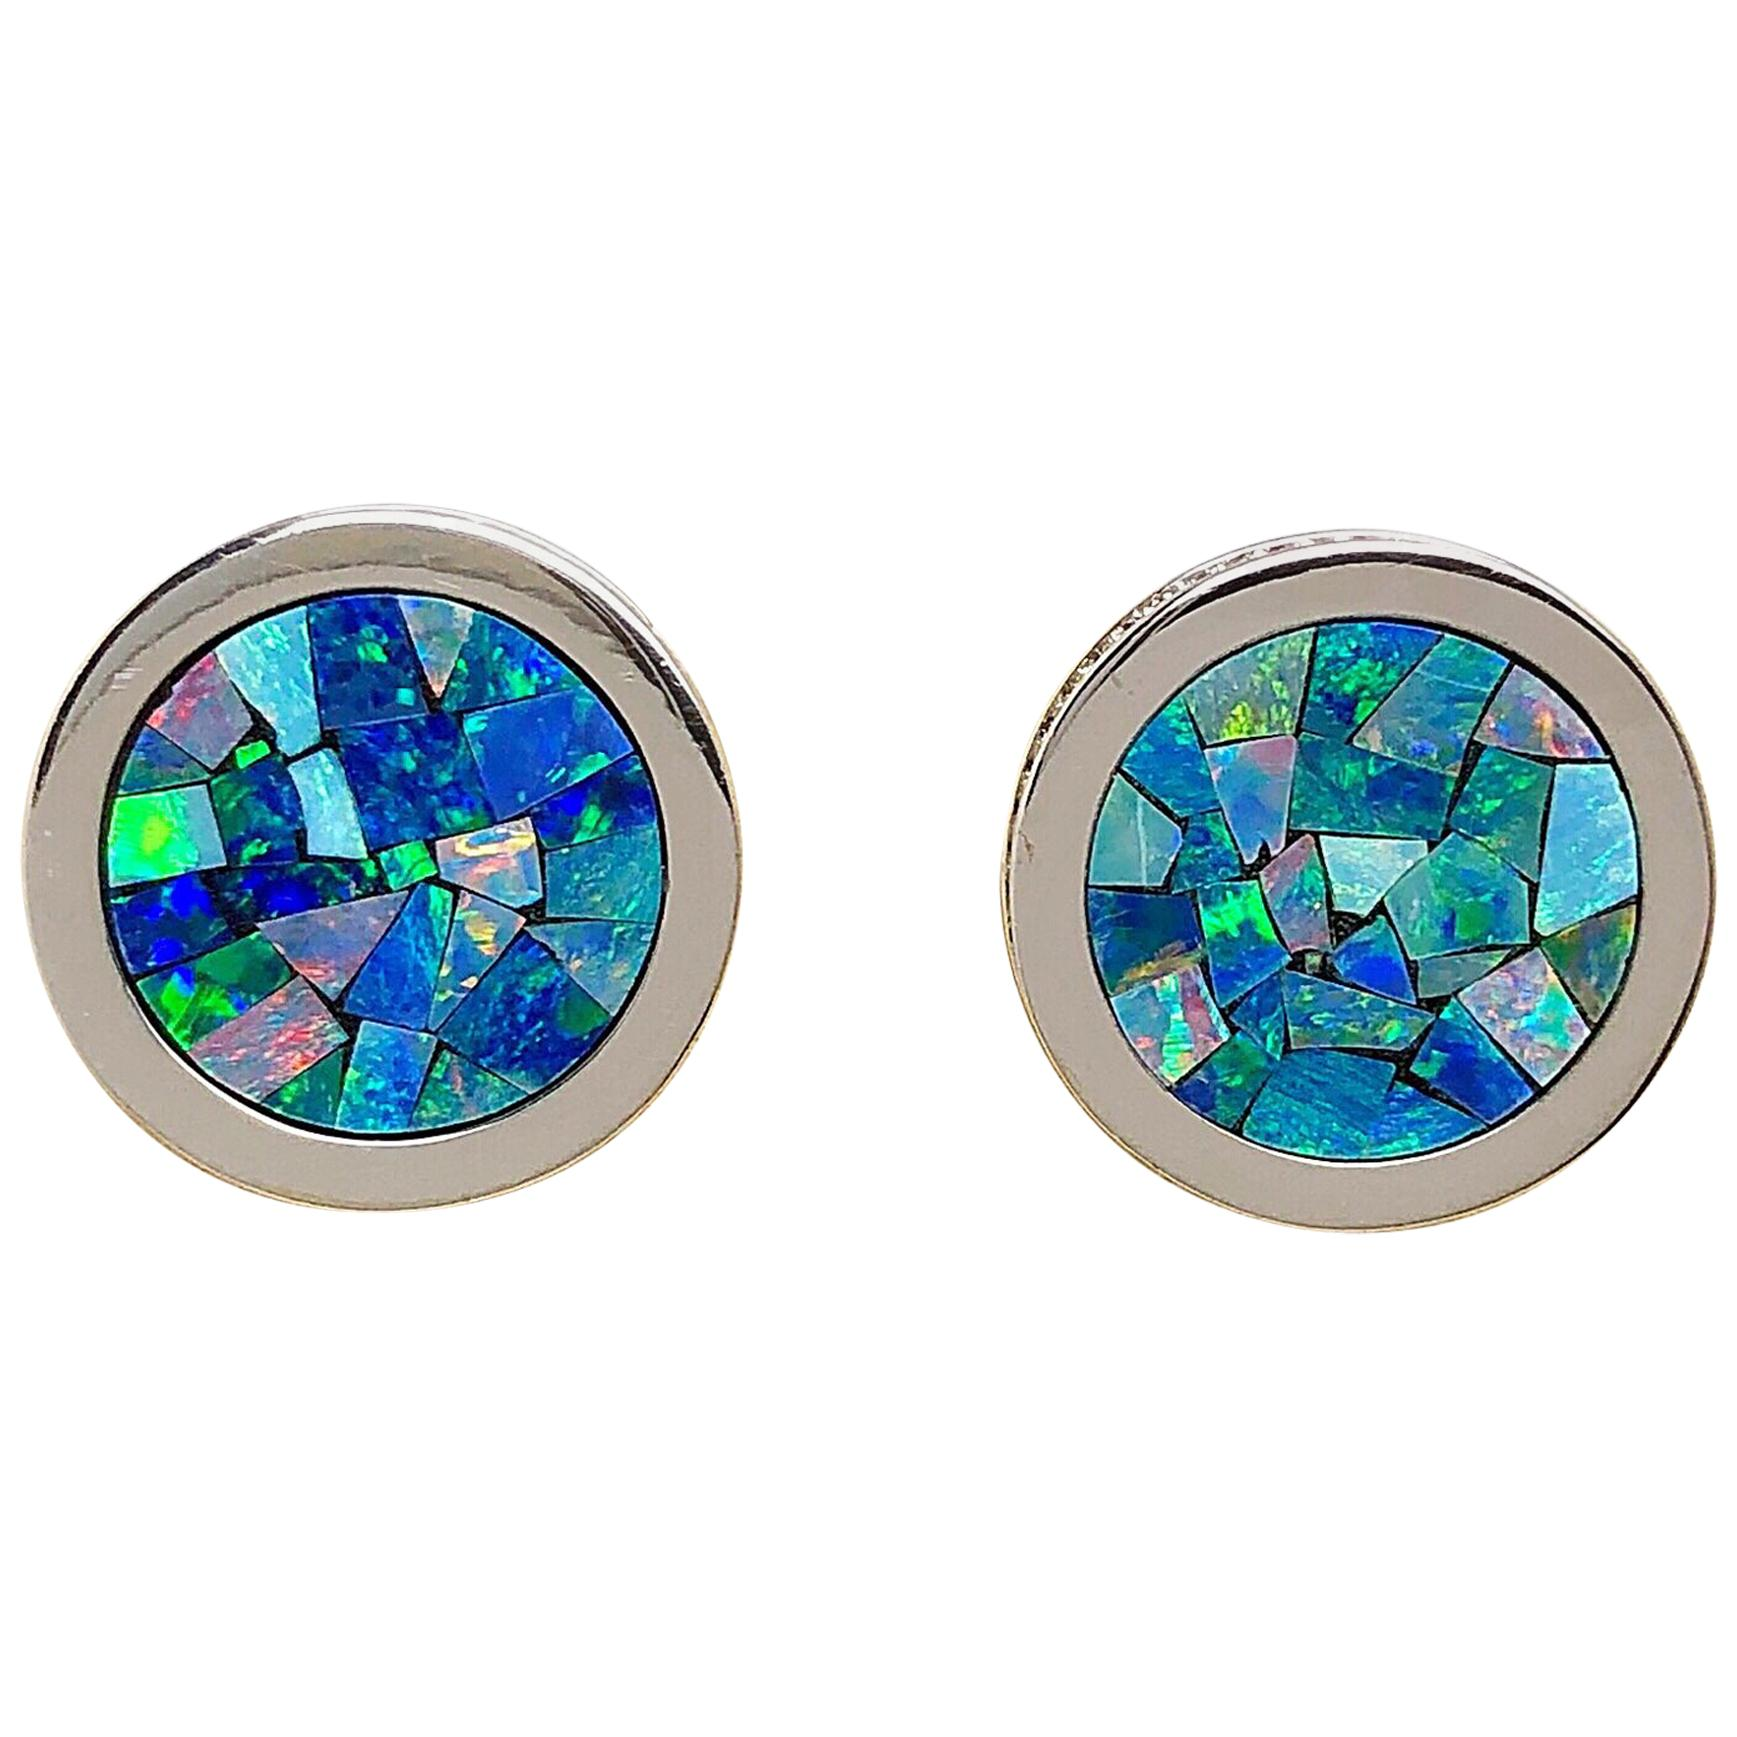 18 Karat, White Gold, Mosaic Opal Cufflinks with Coin Edge